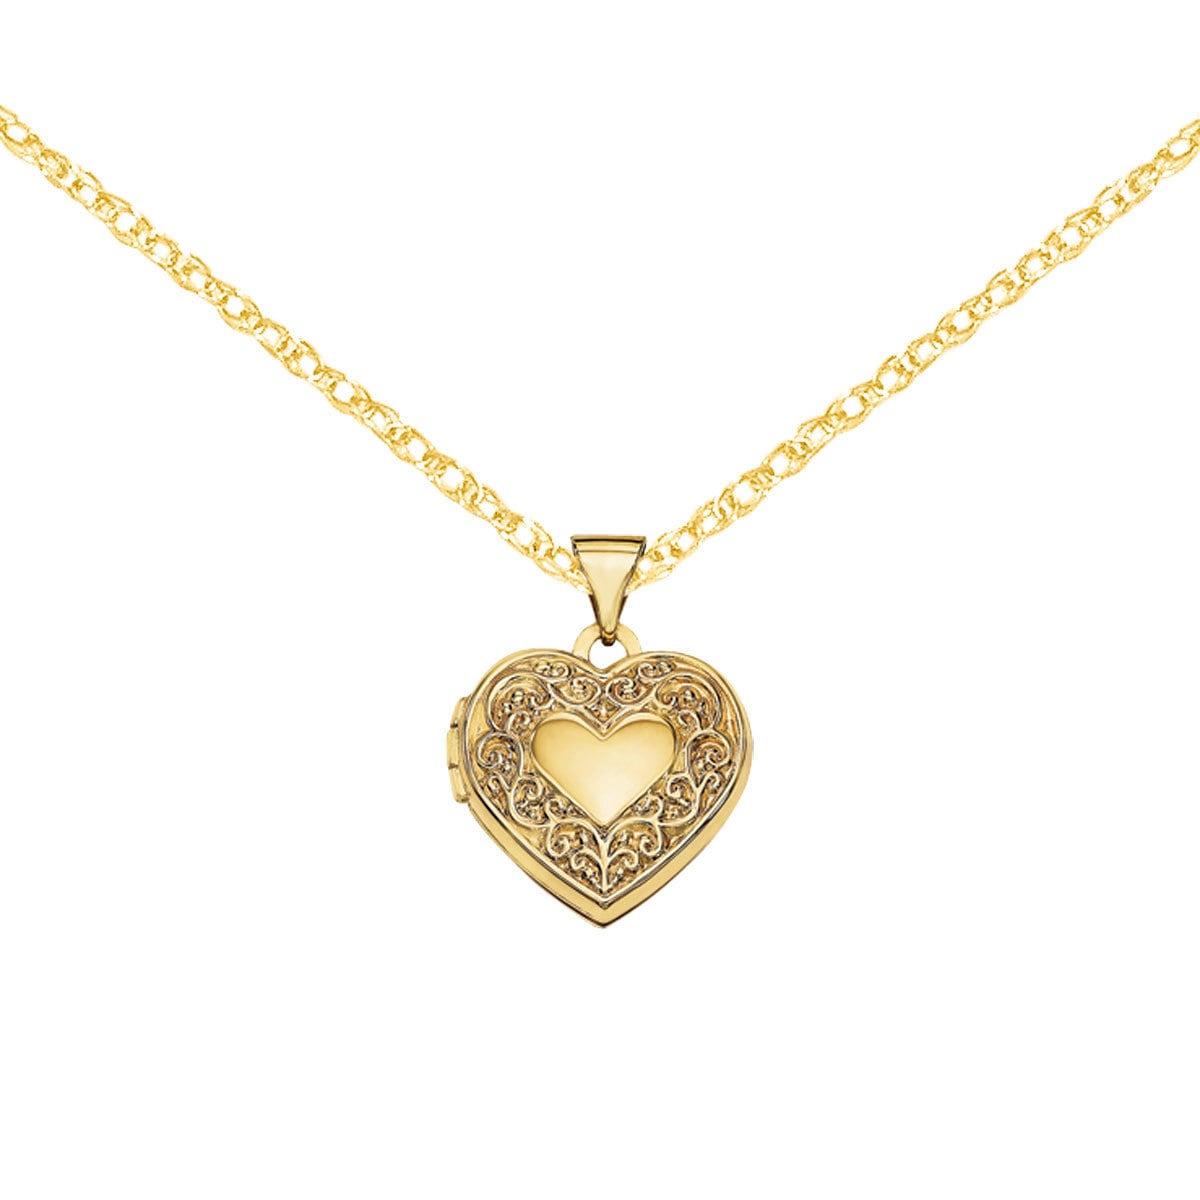 6c81919fa2 Shop Versil 14 Karat Yellow Gold Scroll Heart Locket with 18-inch ...